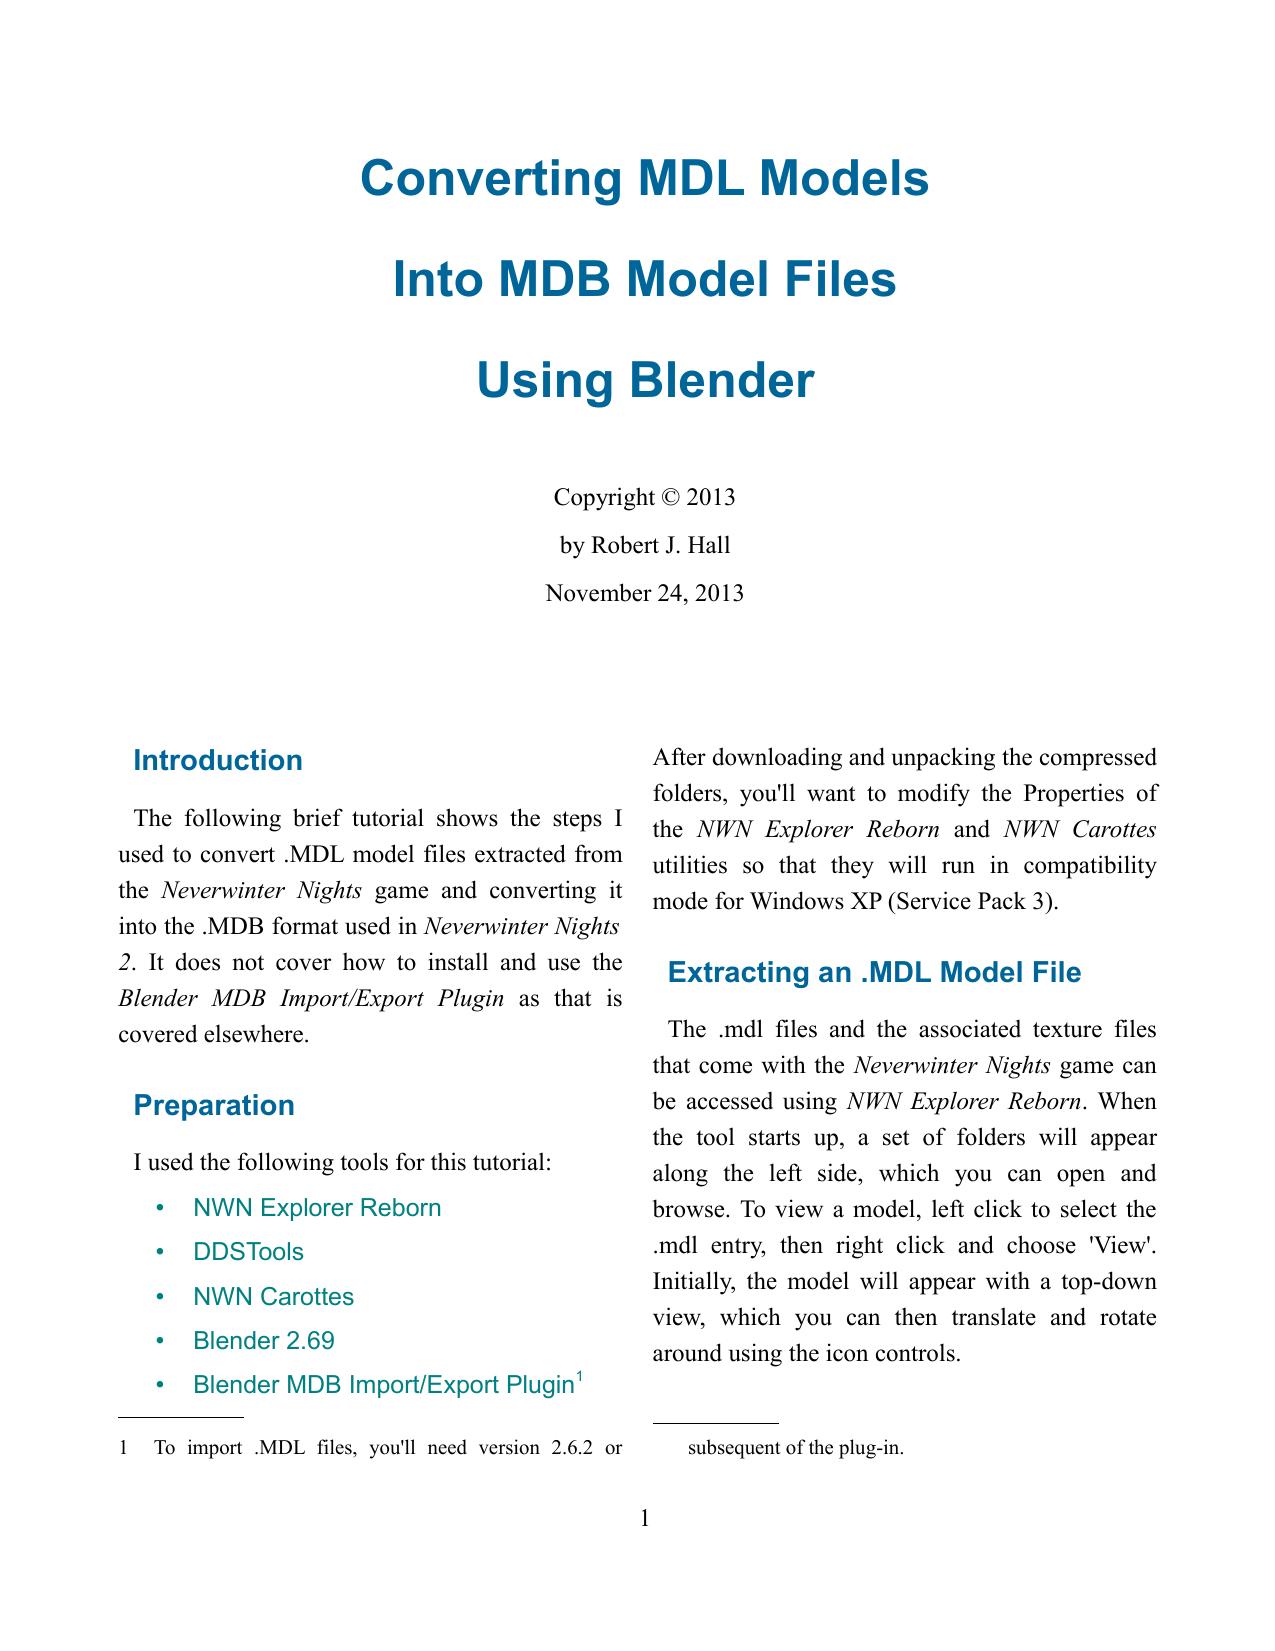 Converting MDL Models Into MDB Model Files Using Blender